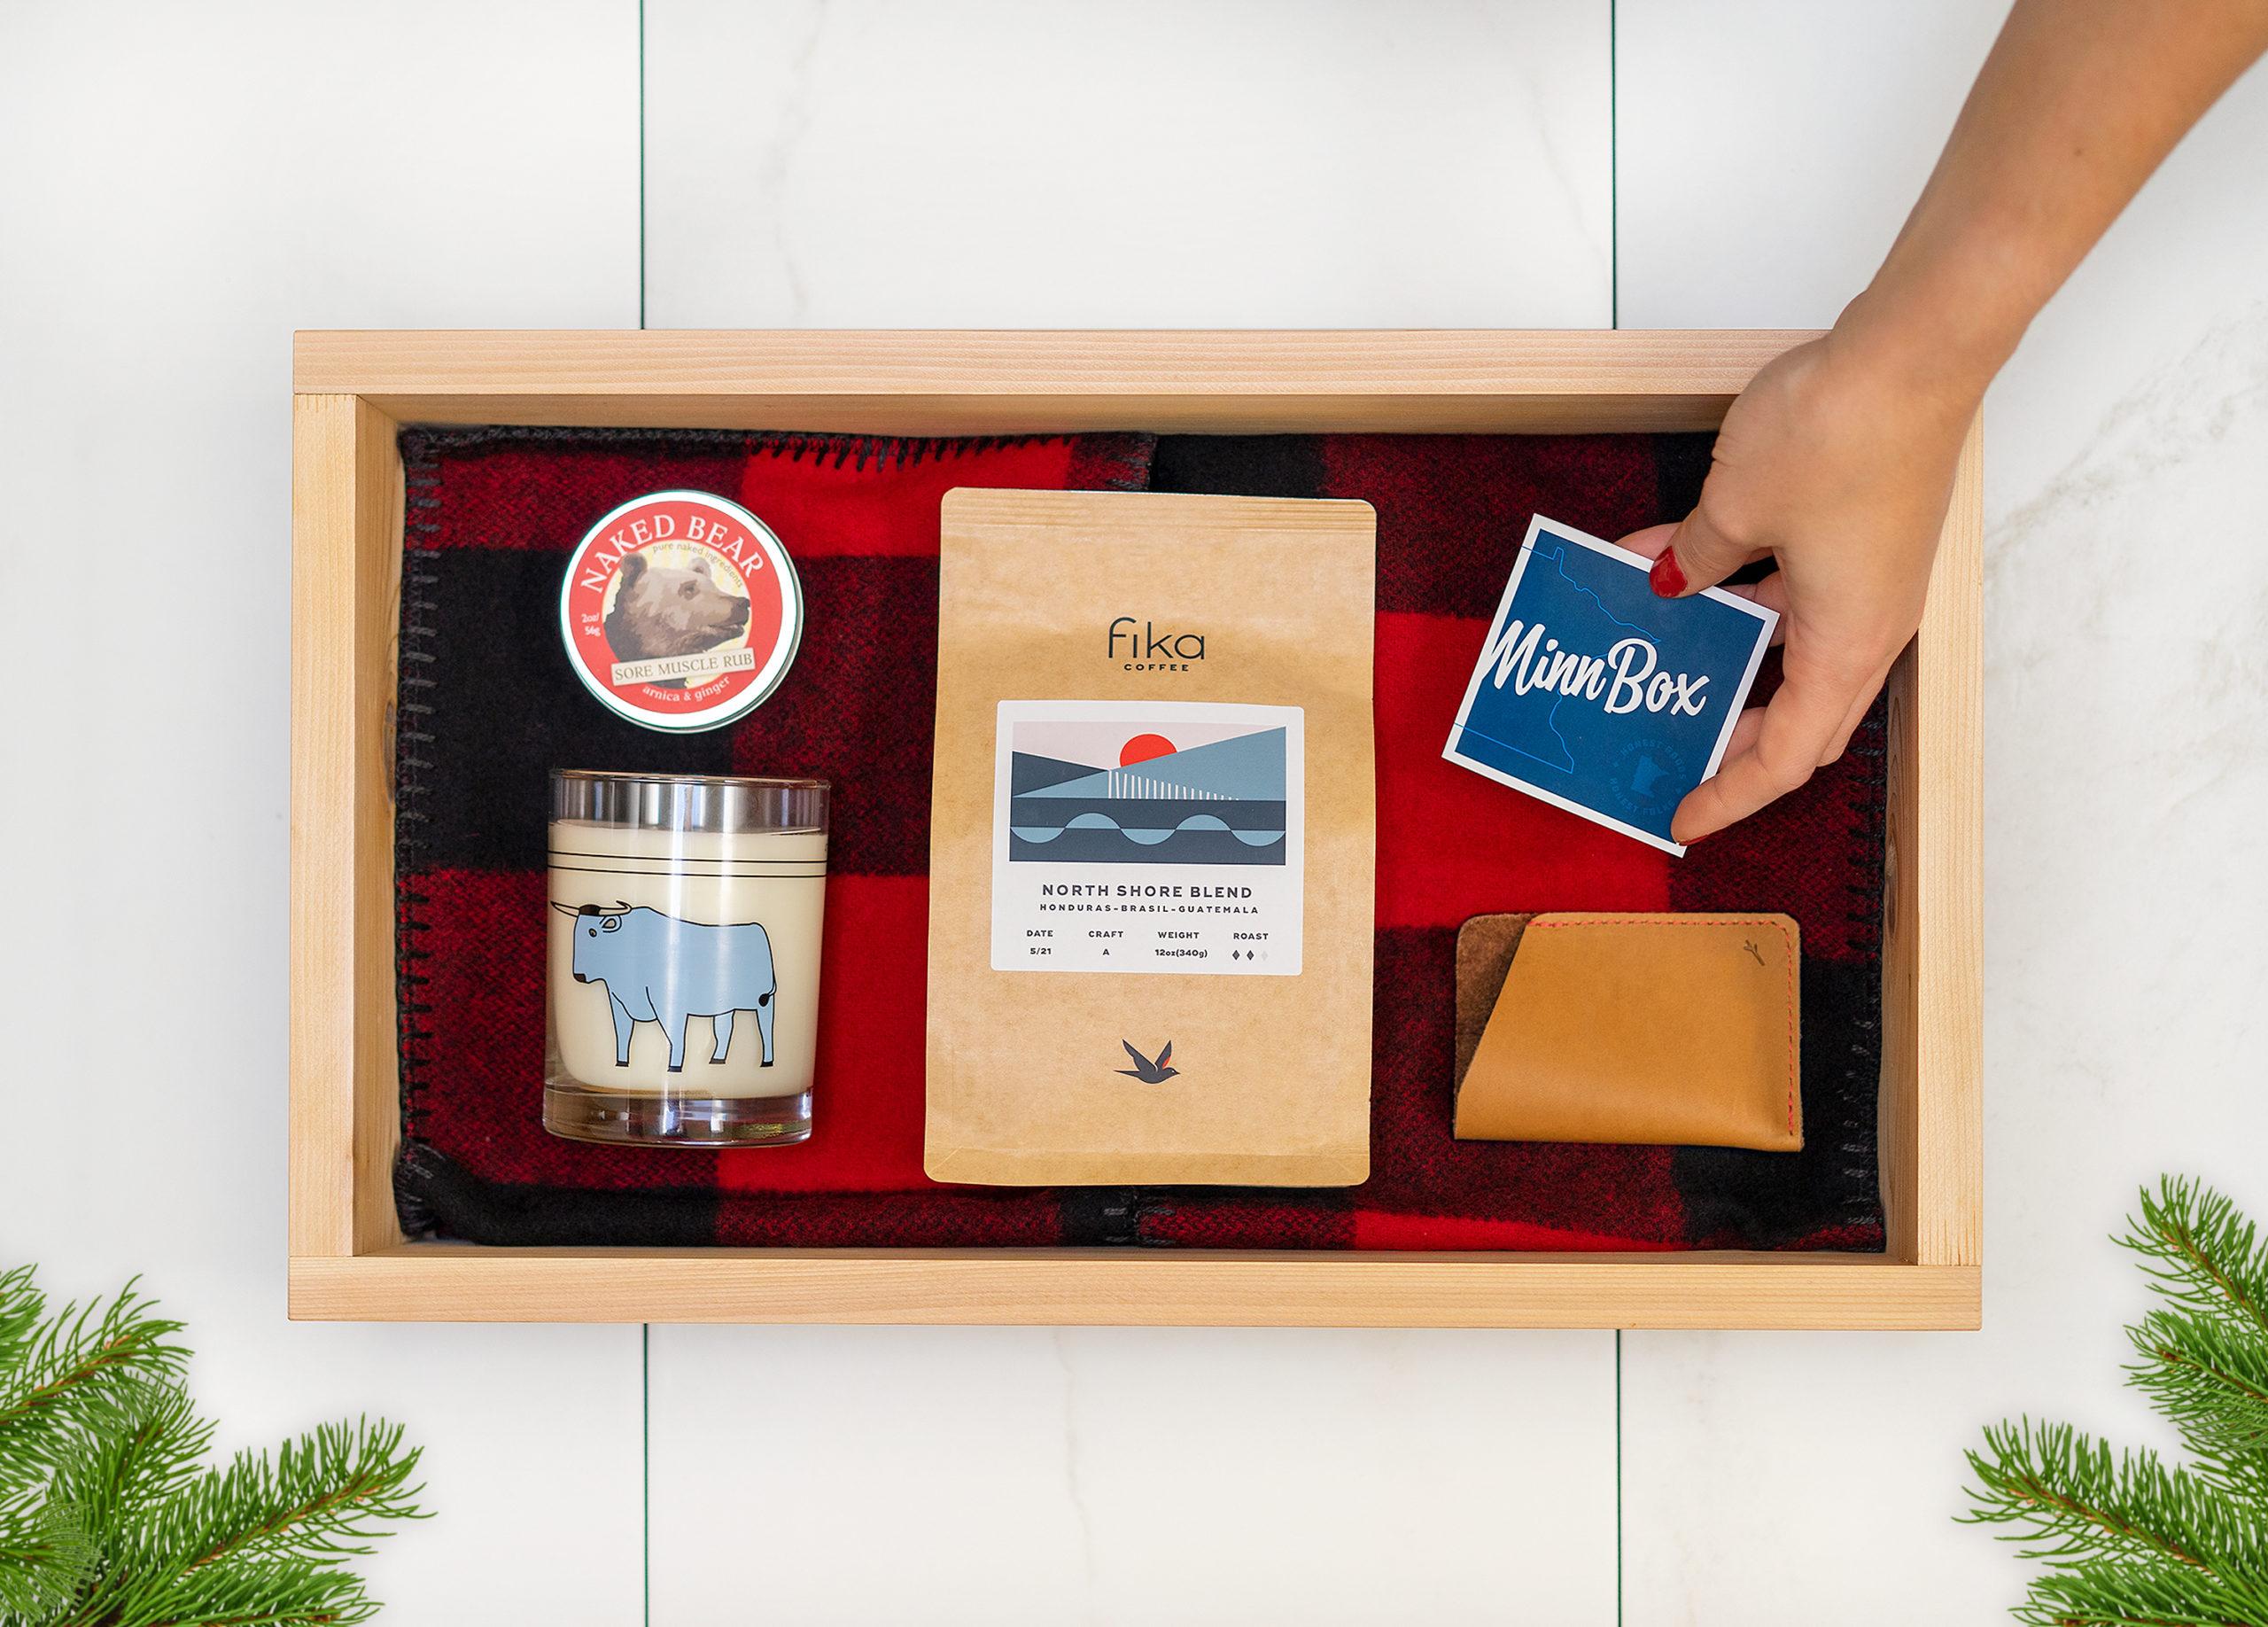 minnbox custom gifts